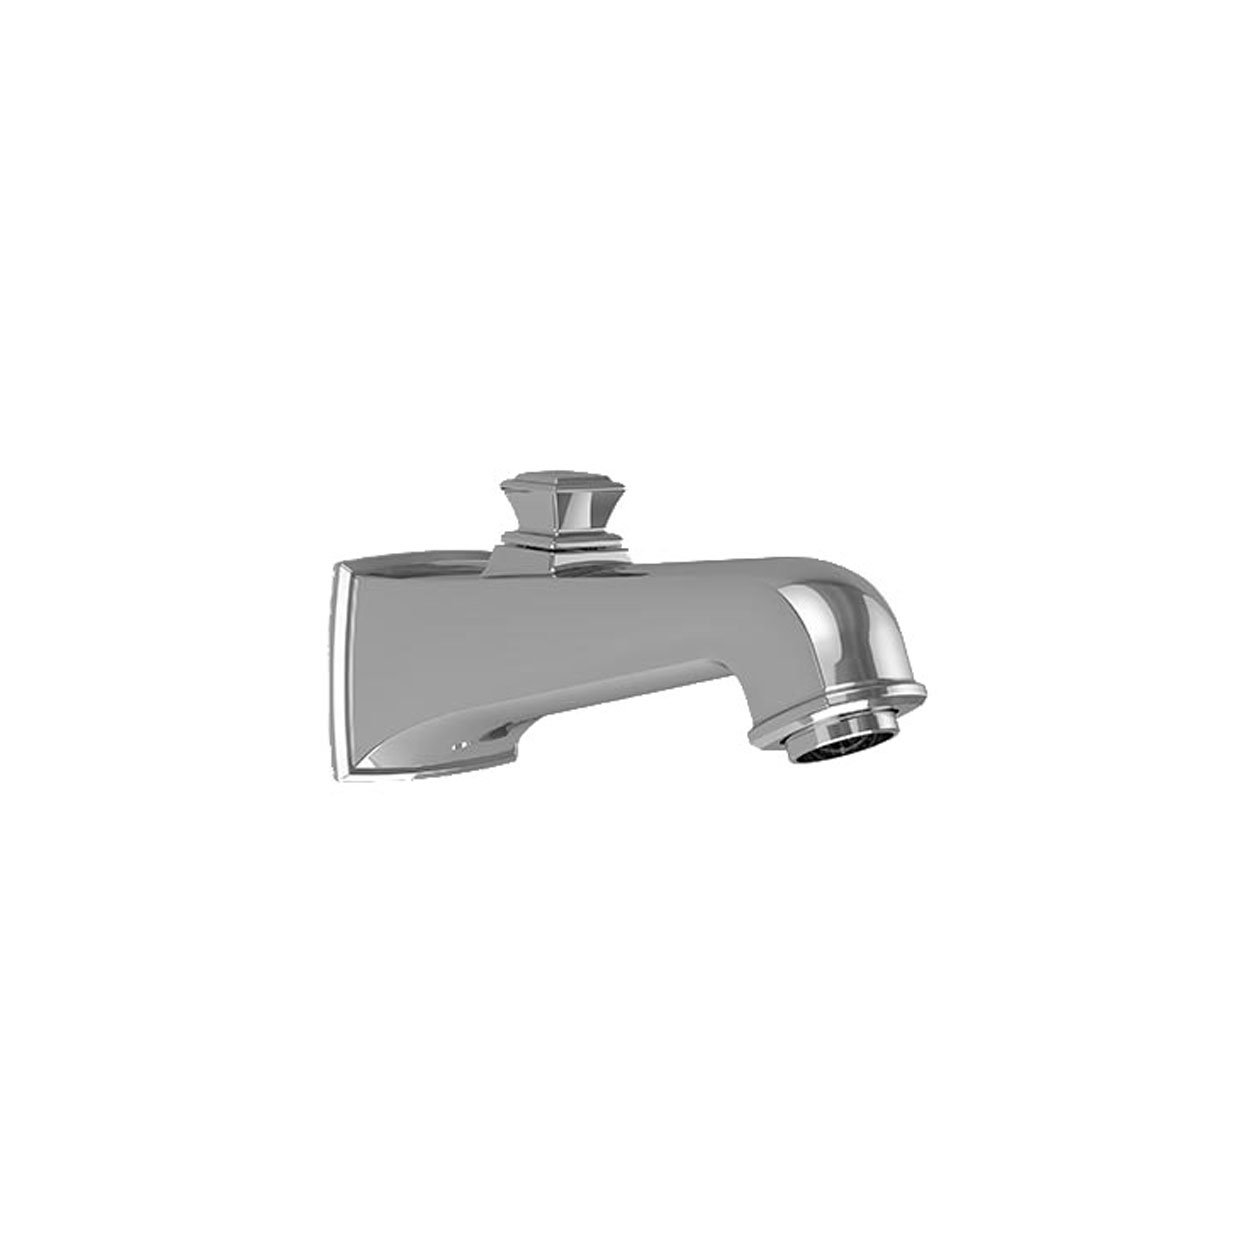 Toto TS221EV#CP Connelly Diverter Bathtub Spout, Polished Chrome Chrome